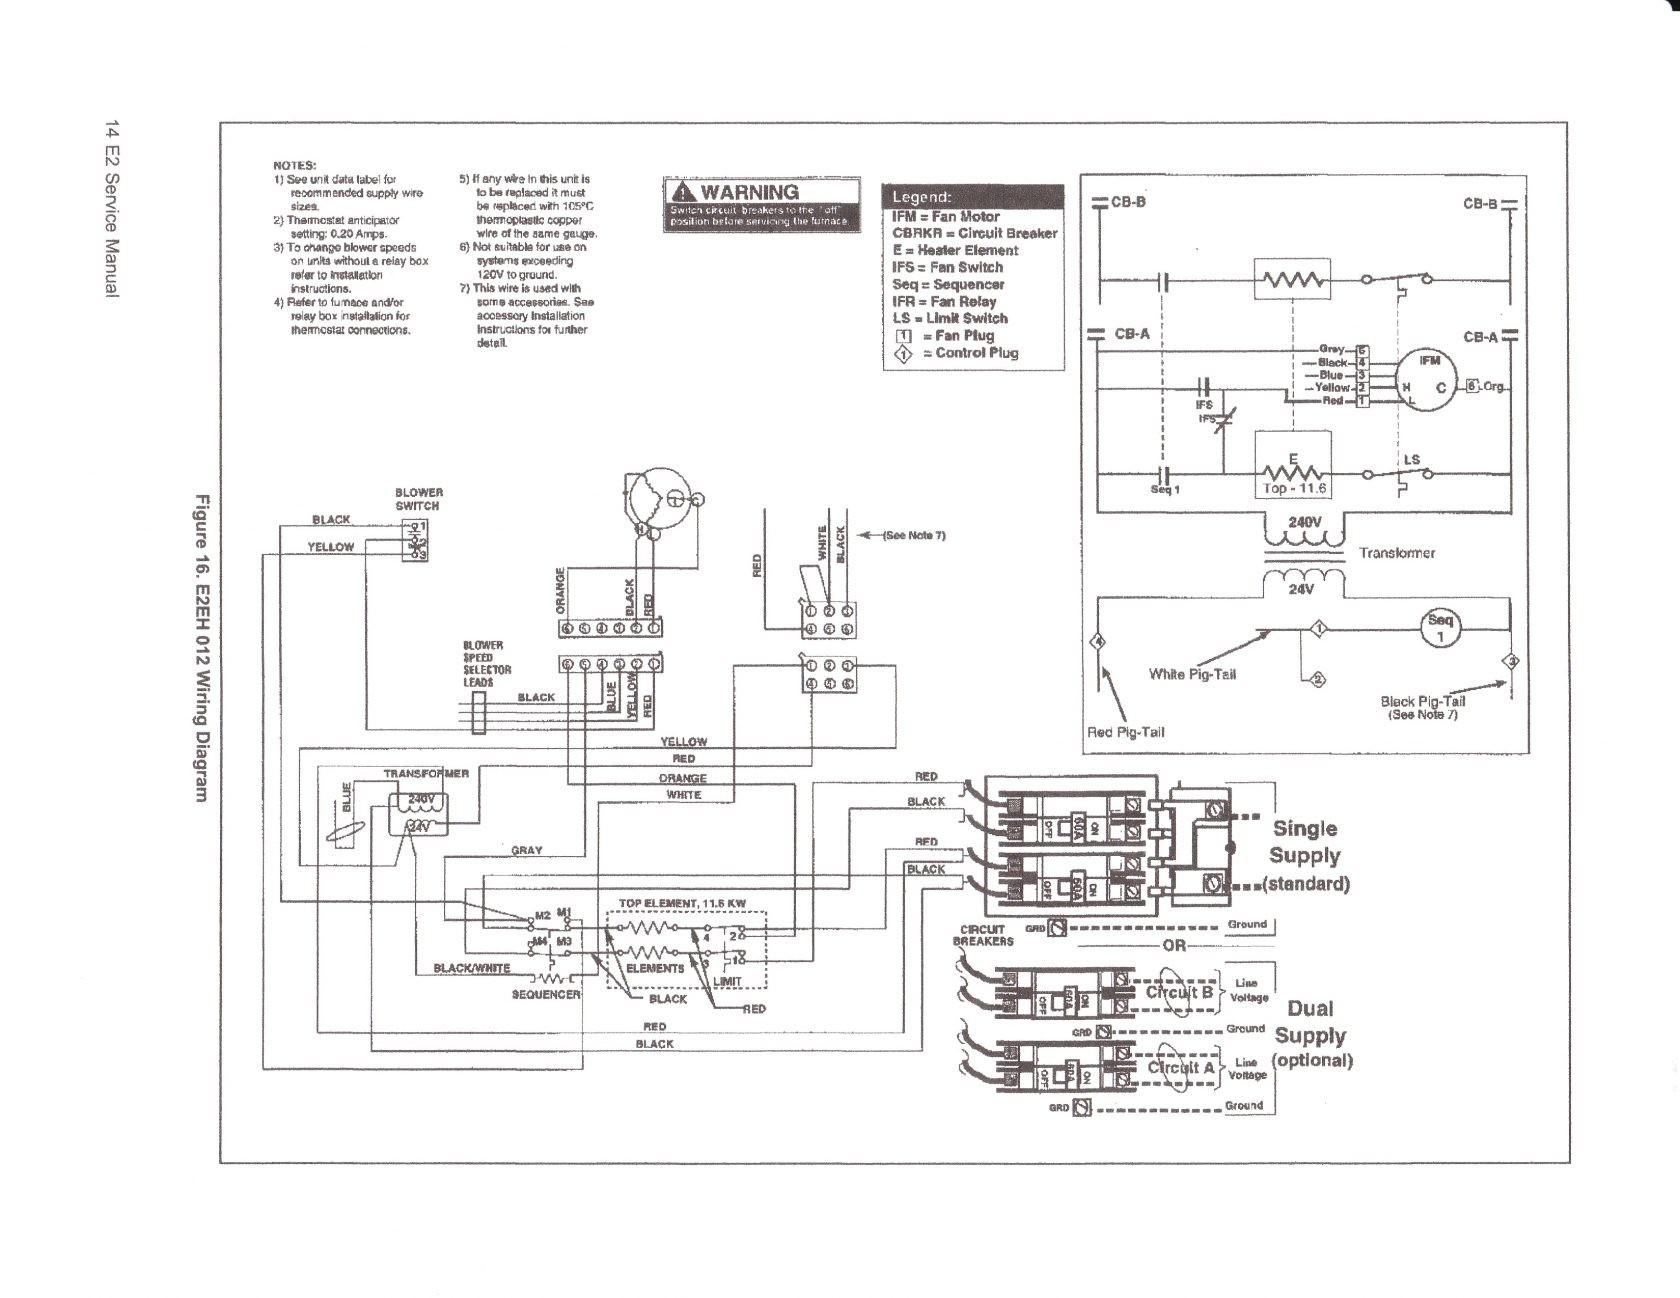 coleman presidential furnace wiring diagram 2 car wiring diagrams rh ethermag co Coleman Electric Furnace Wiring Diagram Furnace Fan Motor Wiring Diagram